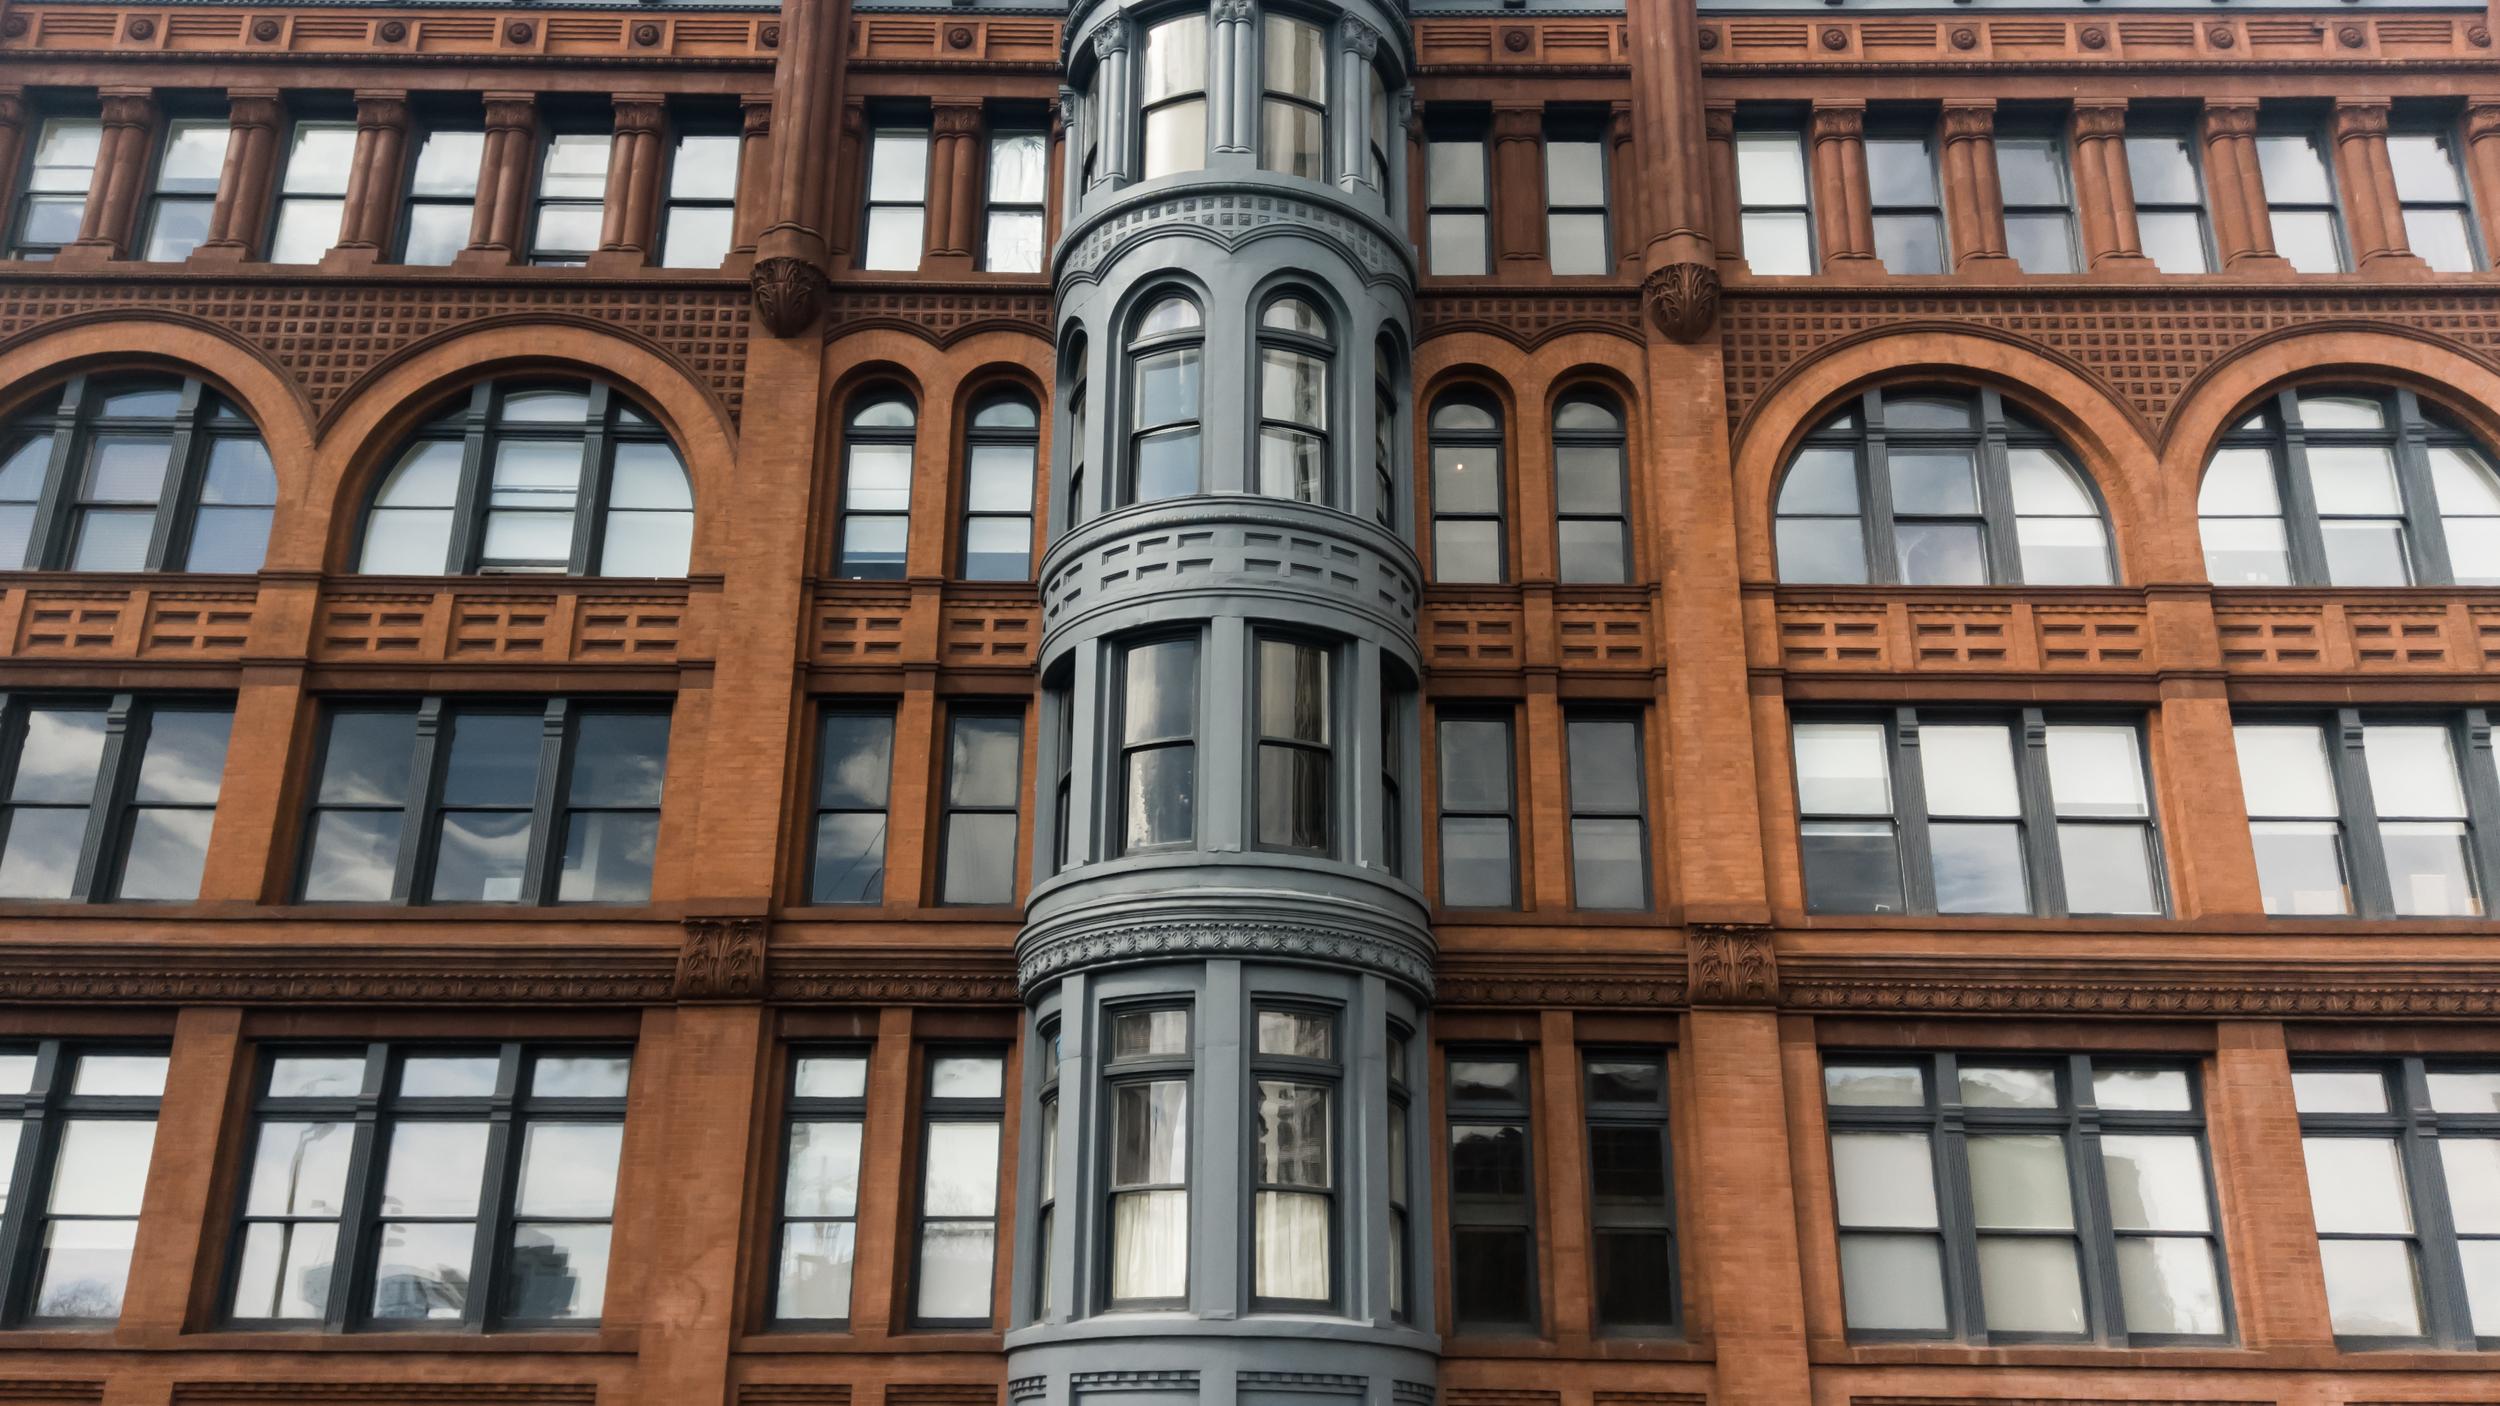 HTC_10_townsnaps-4.jpg